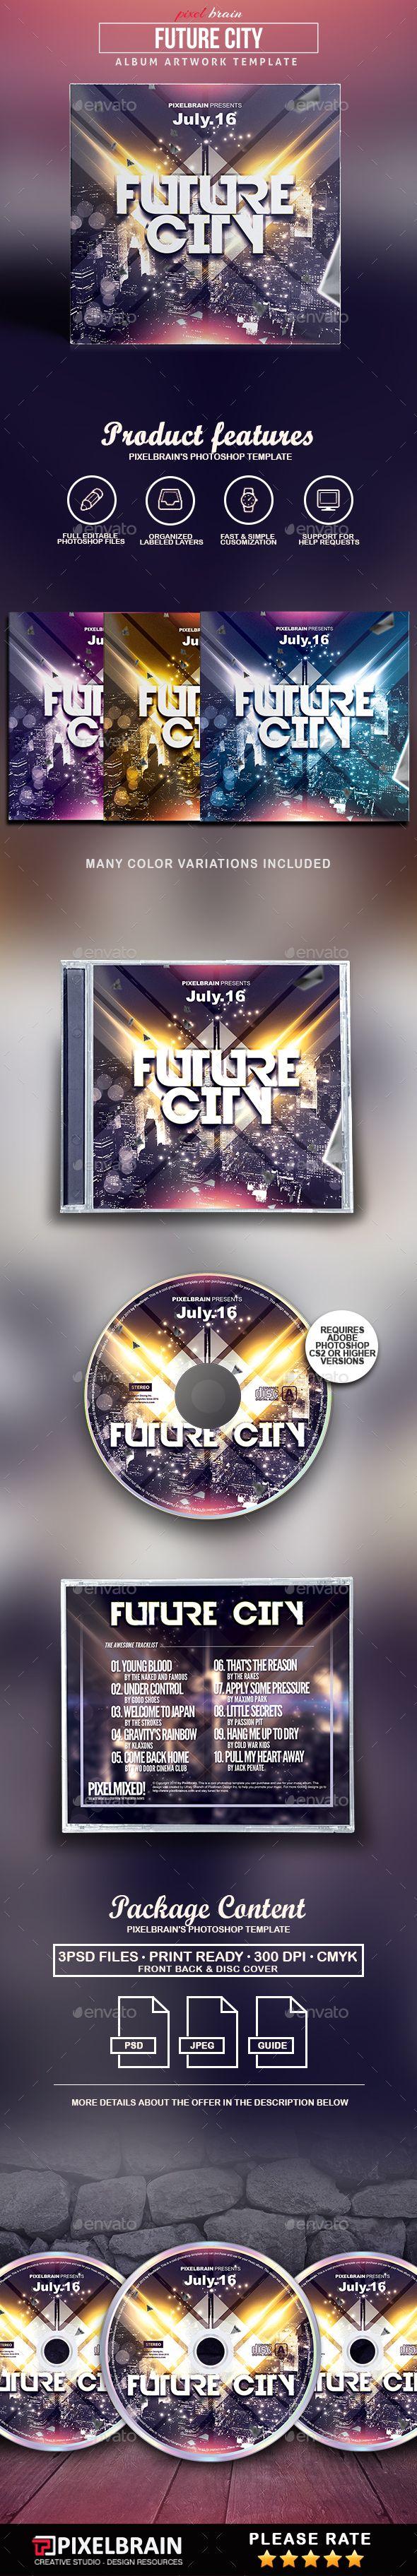 Future City CD Cover Artwork - #CD & DVD #Artwork Print Templates Download here: https://graphicriver.net/item/future-city-cd-cover-artwork/19535592?ref=alena994